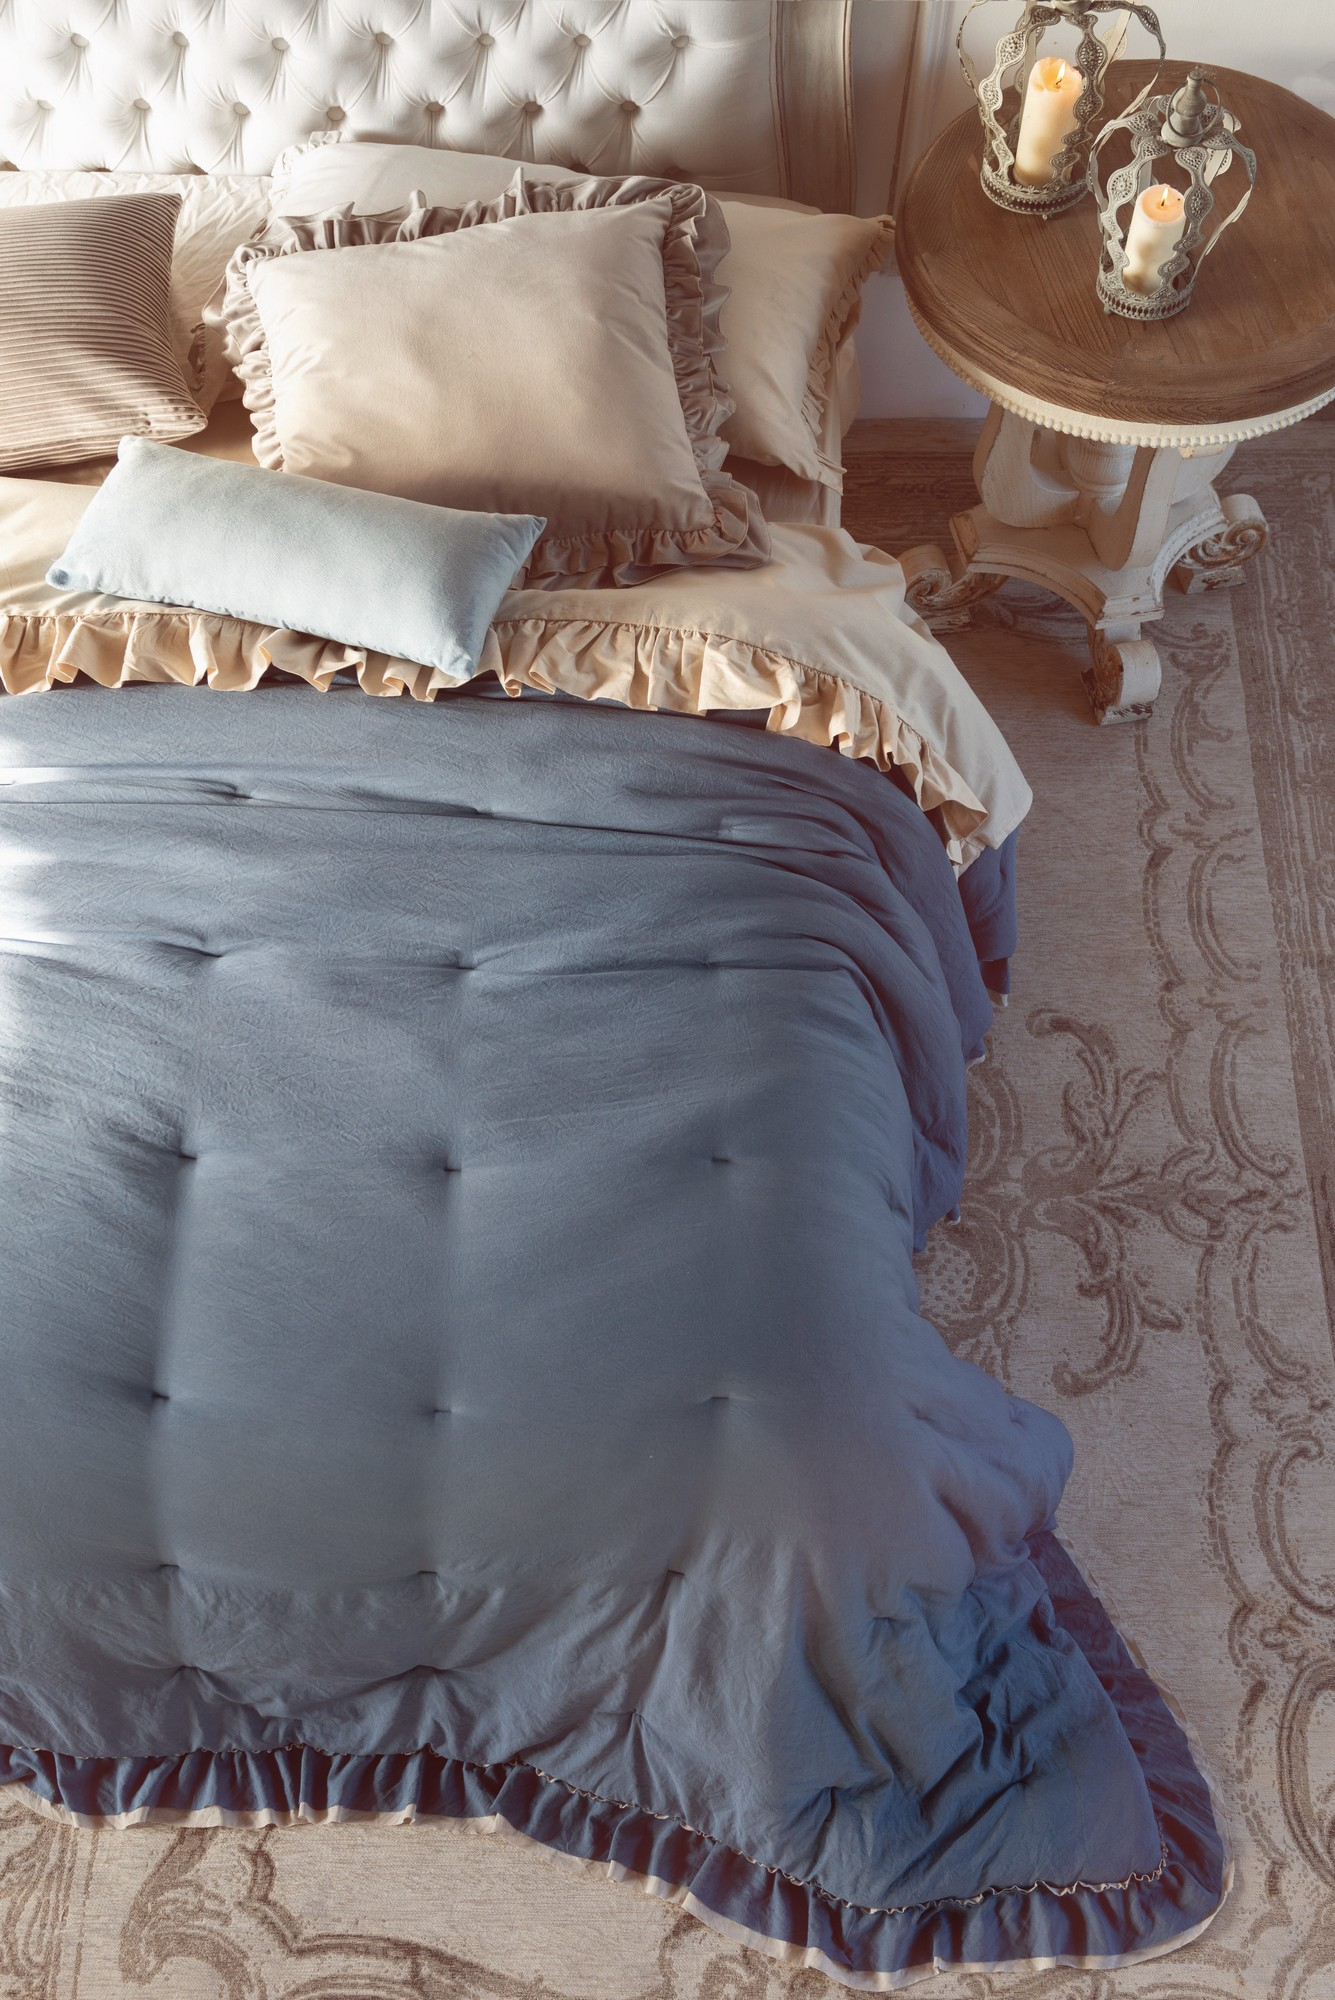 Trapunta Blanc Mariclo Singola Loving Con Gale 350 Gsm Blu Carta Da Zucchero Blanc Mariclo Reggio Emilia